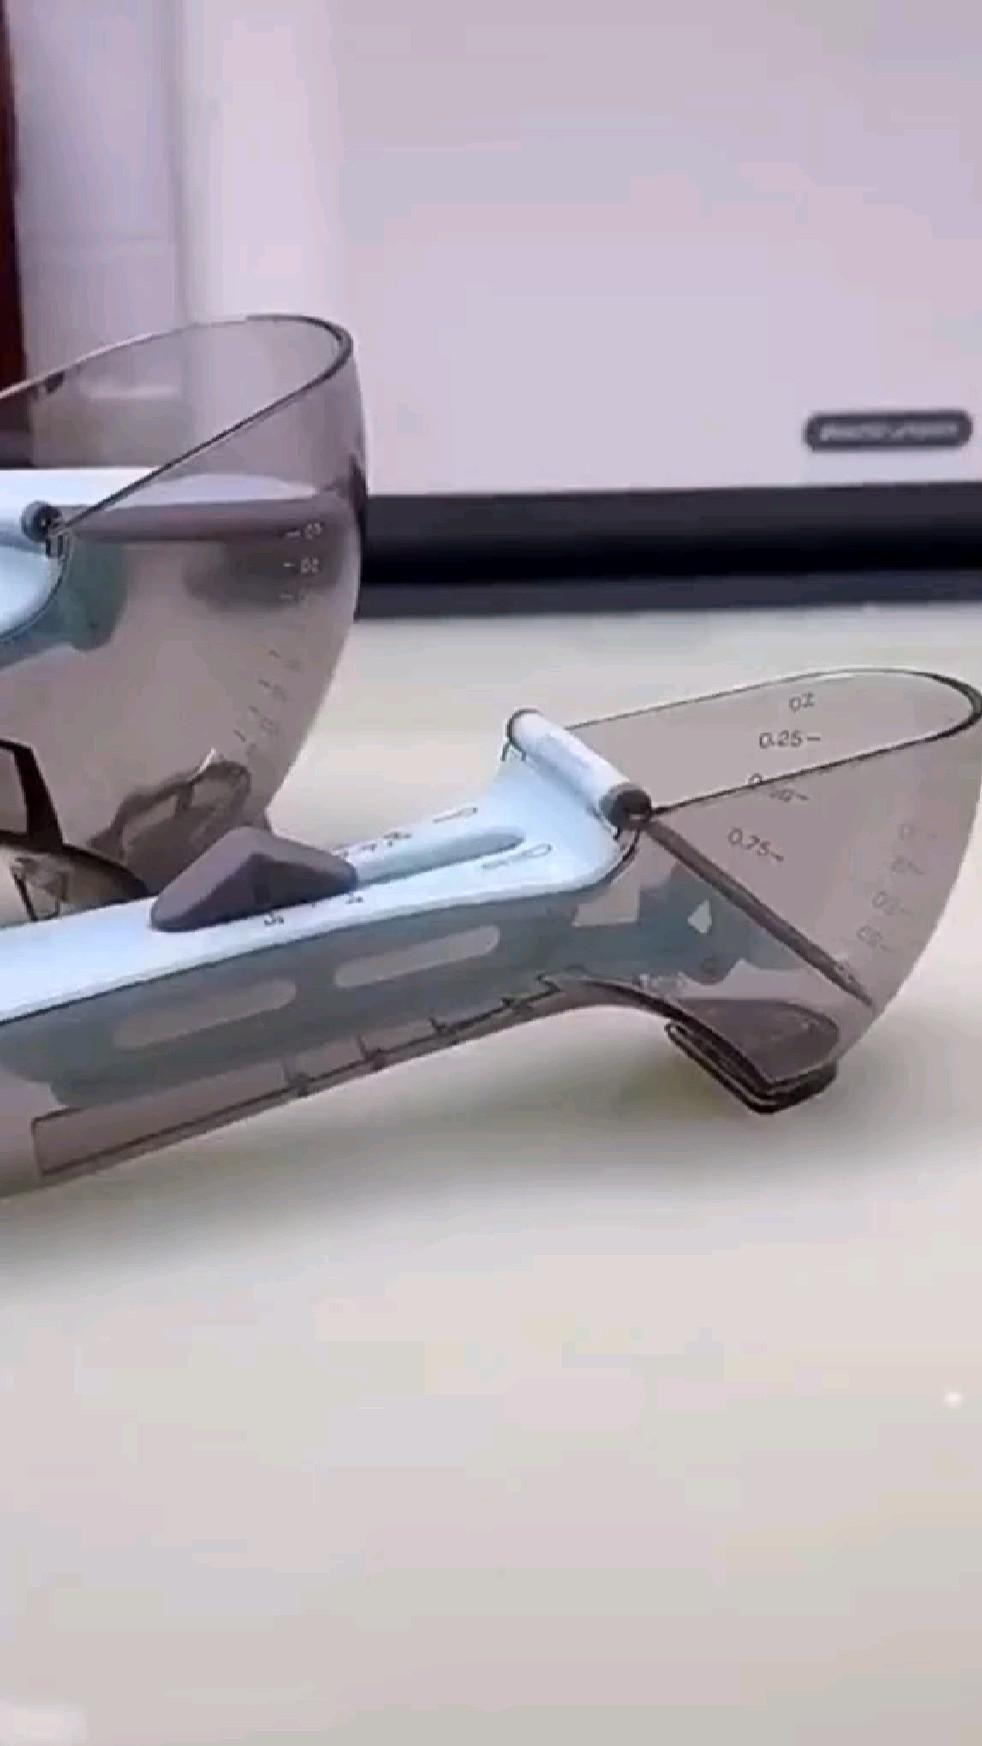 Unique Gadgets | Very Useful